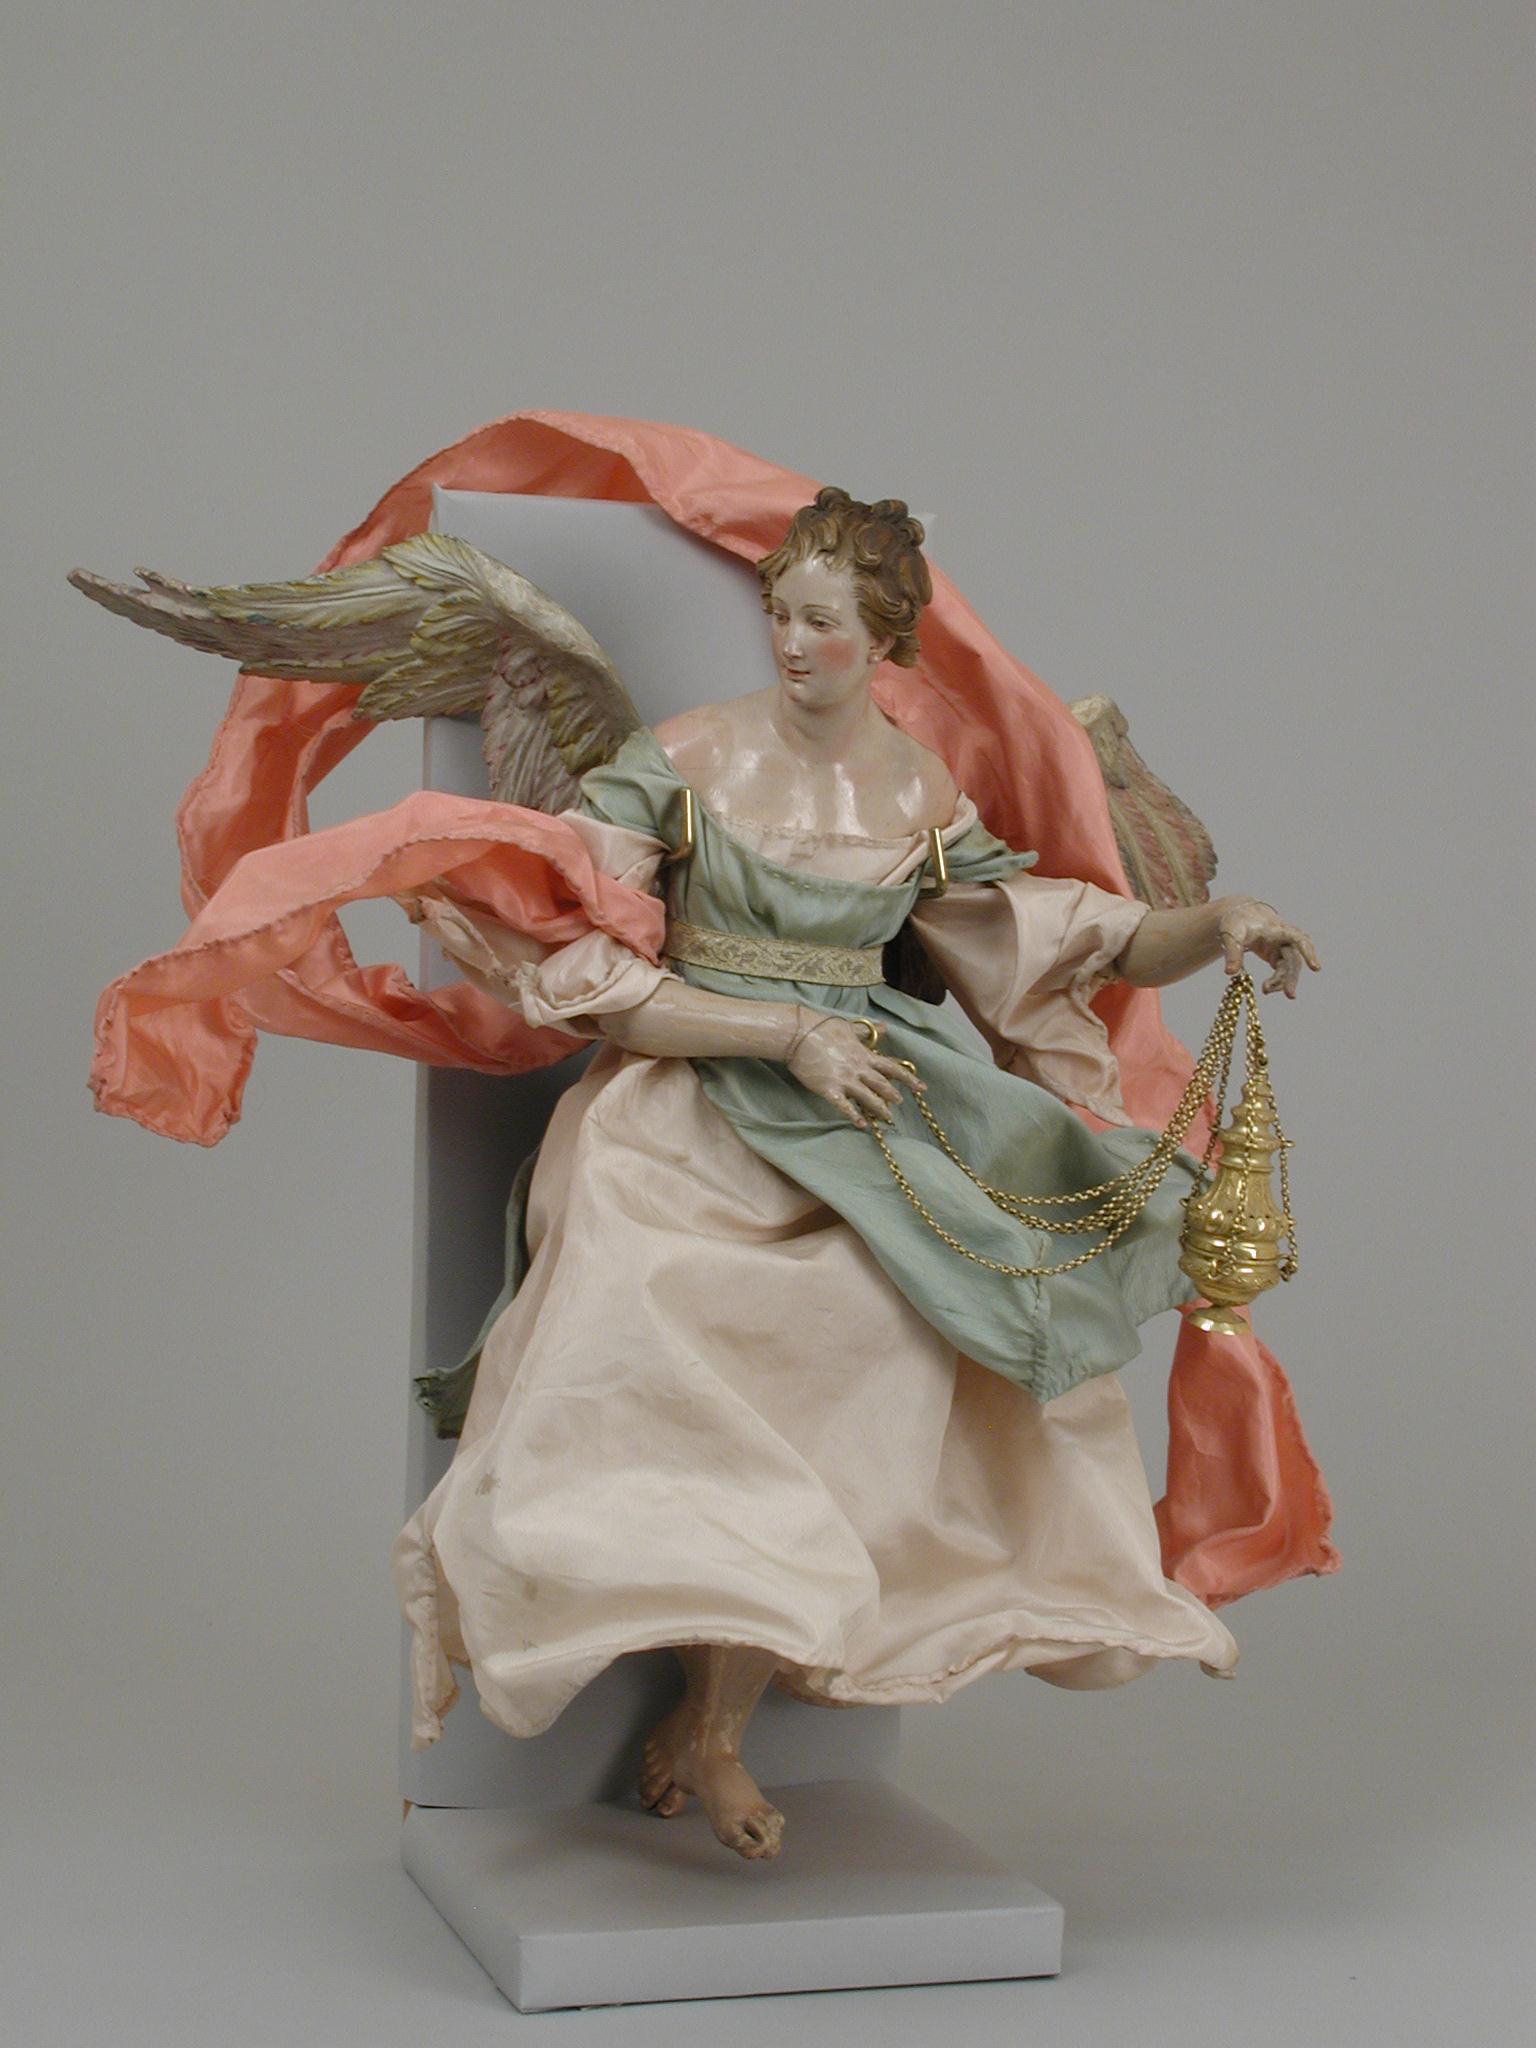 https://images.metmuseum.org/CRDImages/es/original/LC-64_164_47.jpg